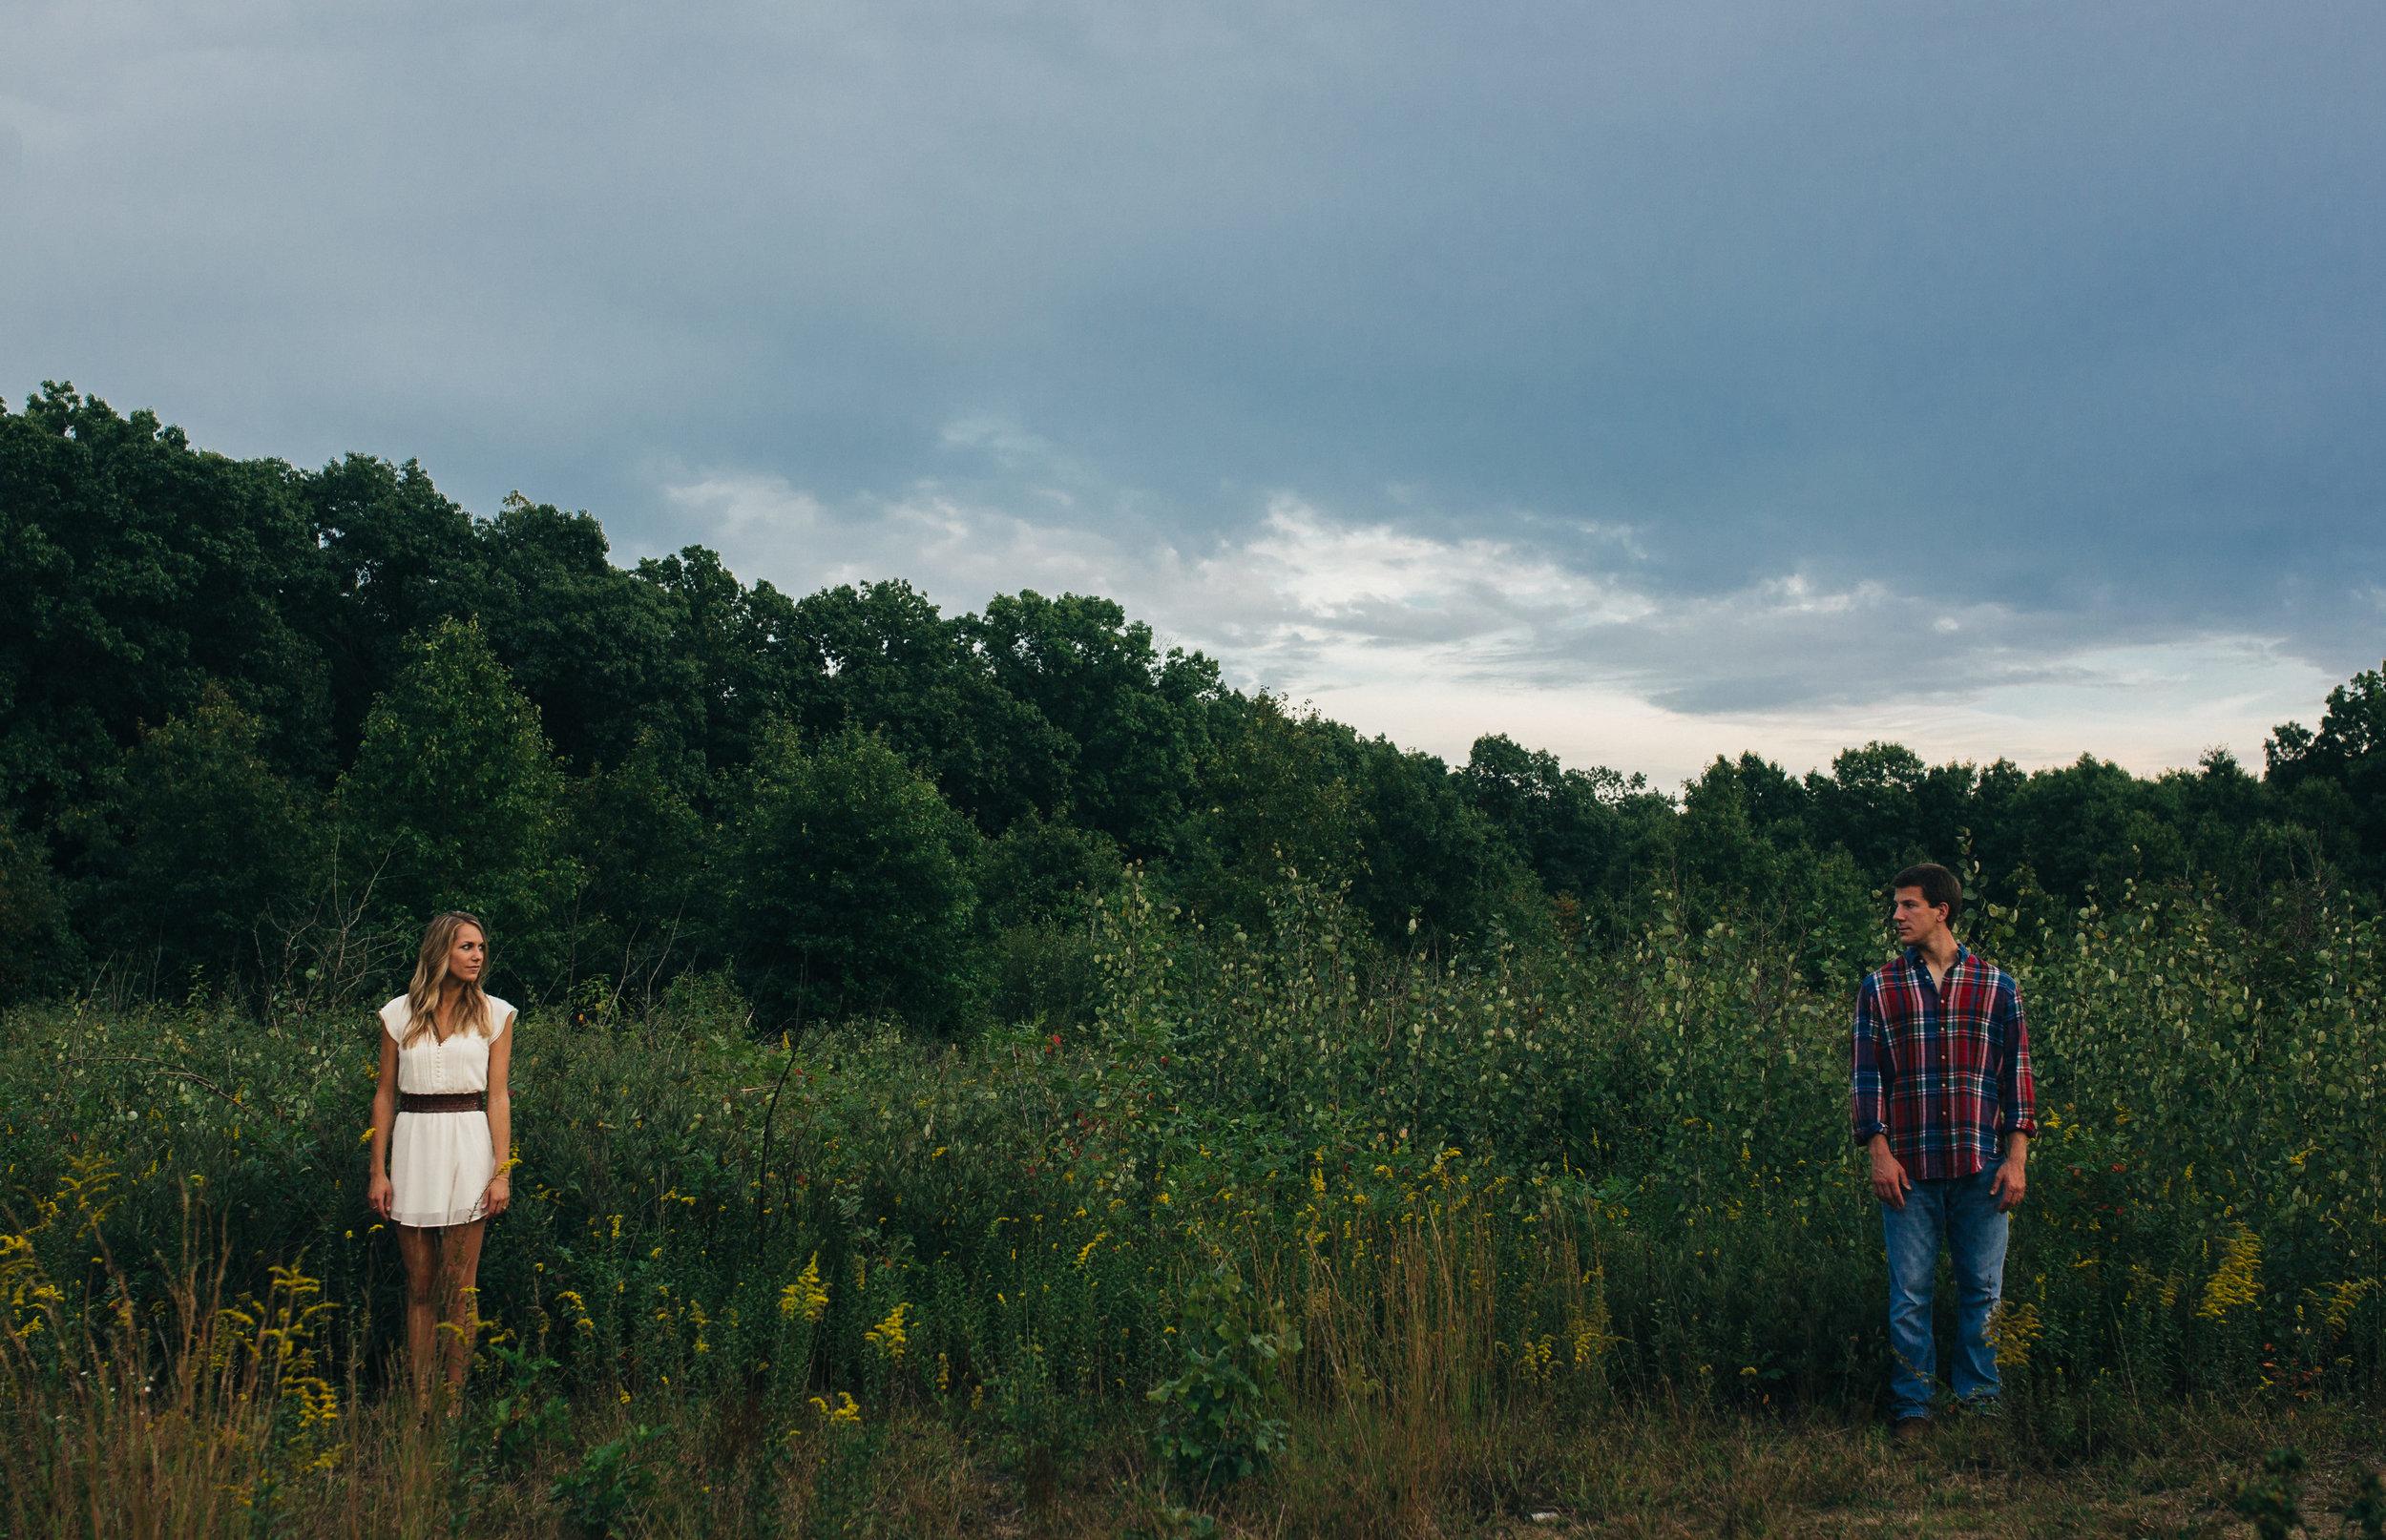 Toledo Ohio wedding photographer at Oak Openings.